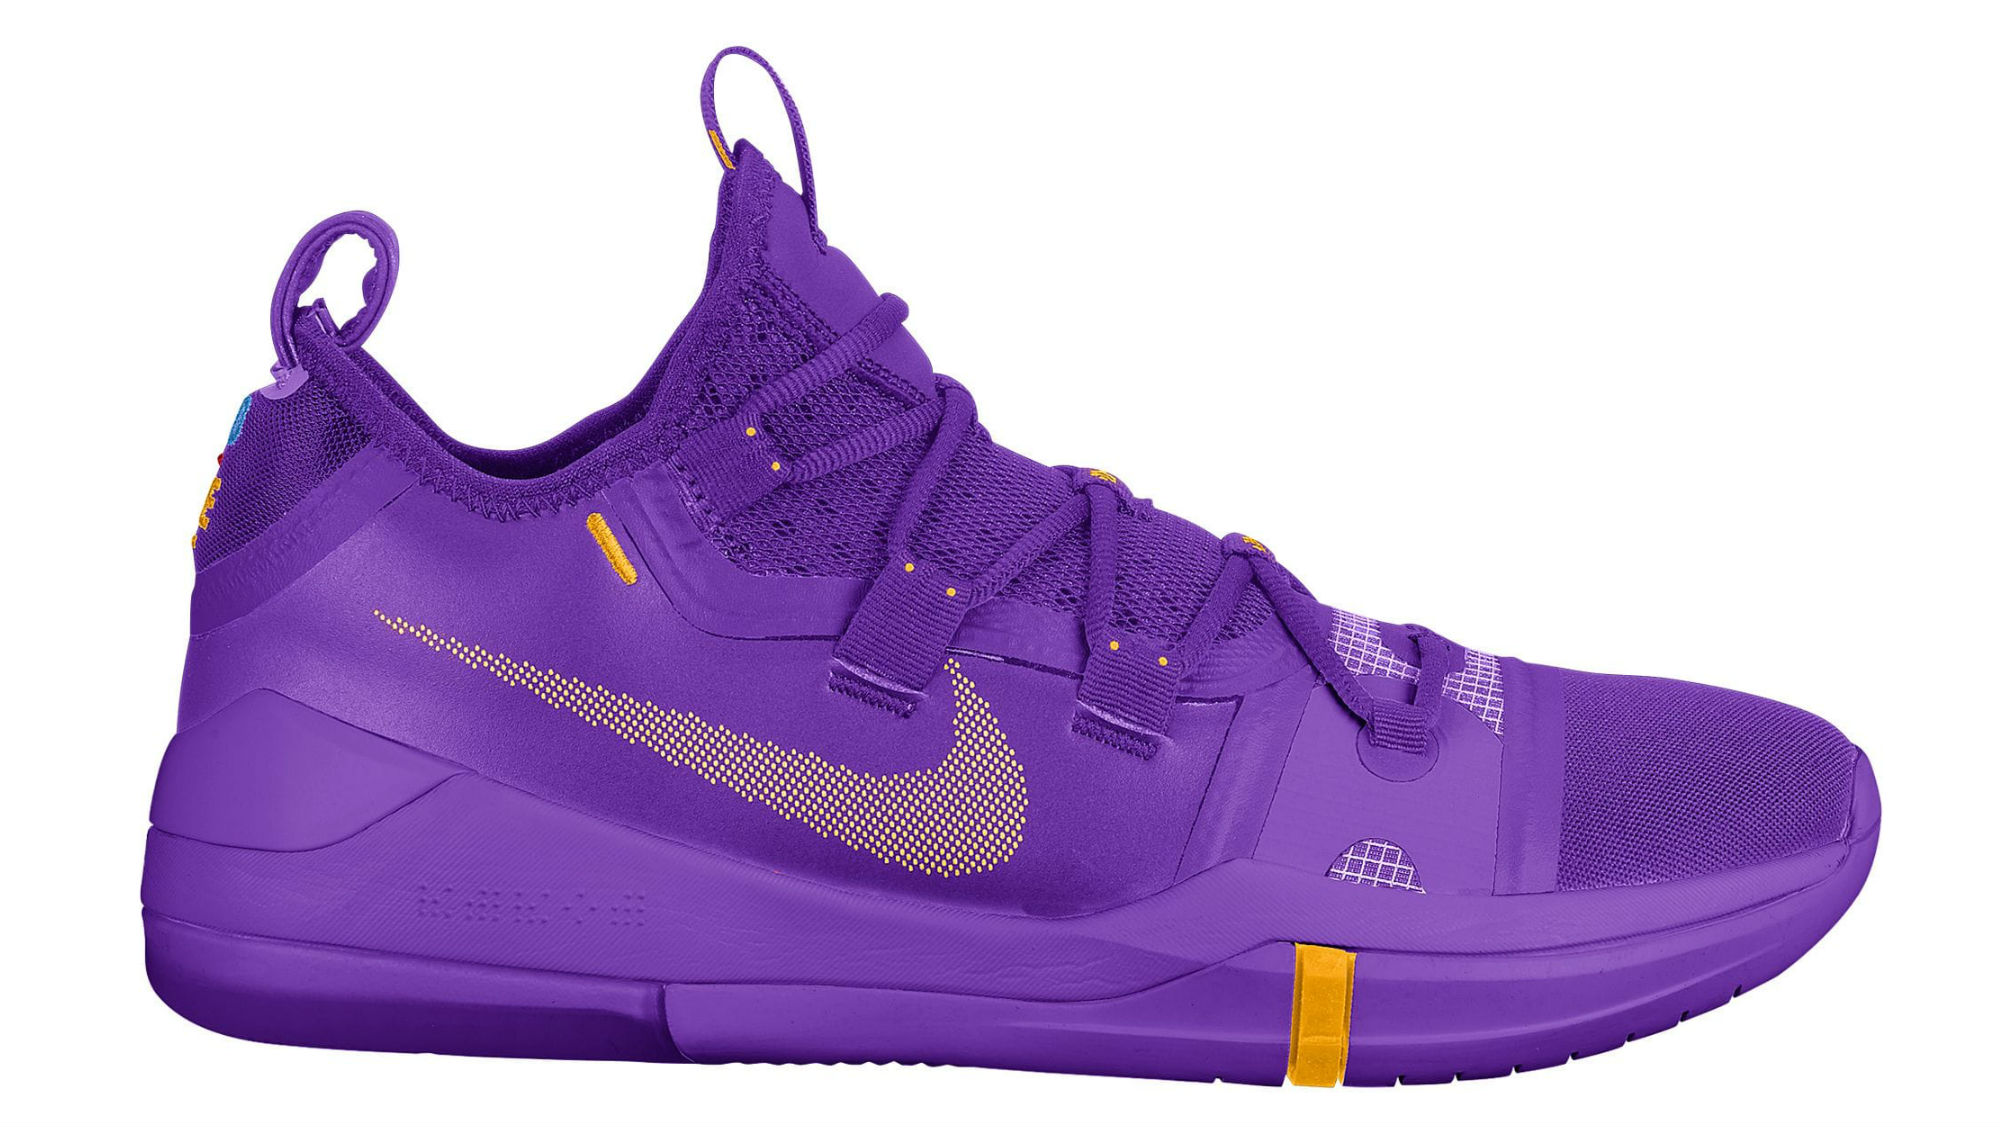 8e51cd3455cd Nike Kobe A.D. Color Pack Release Date